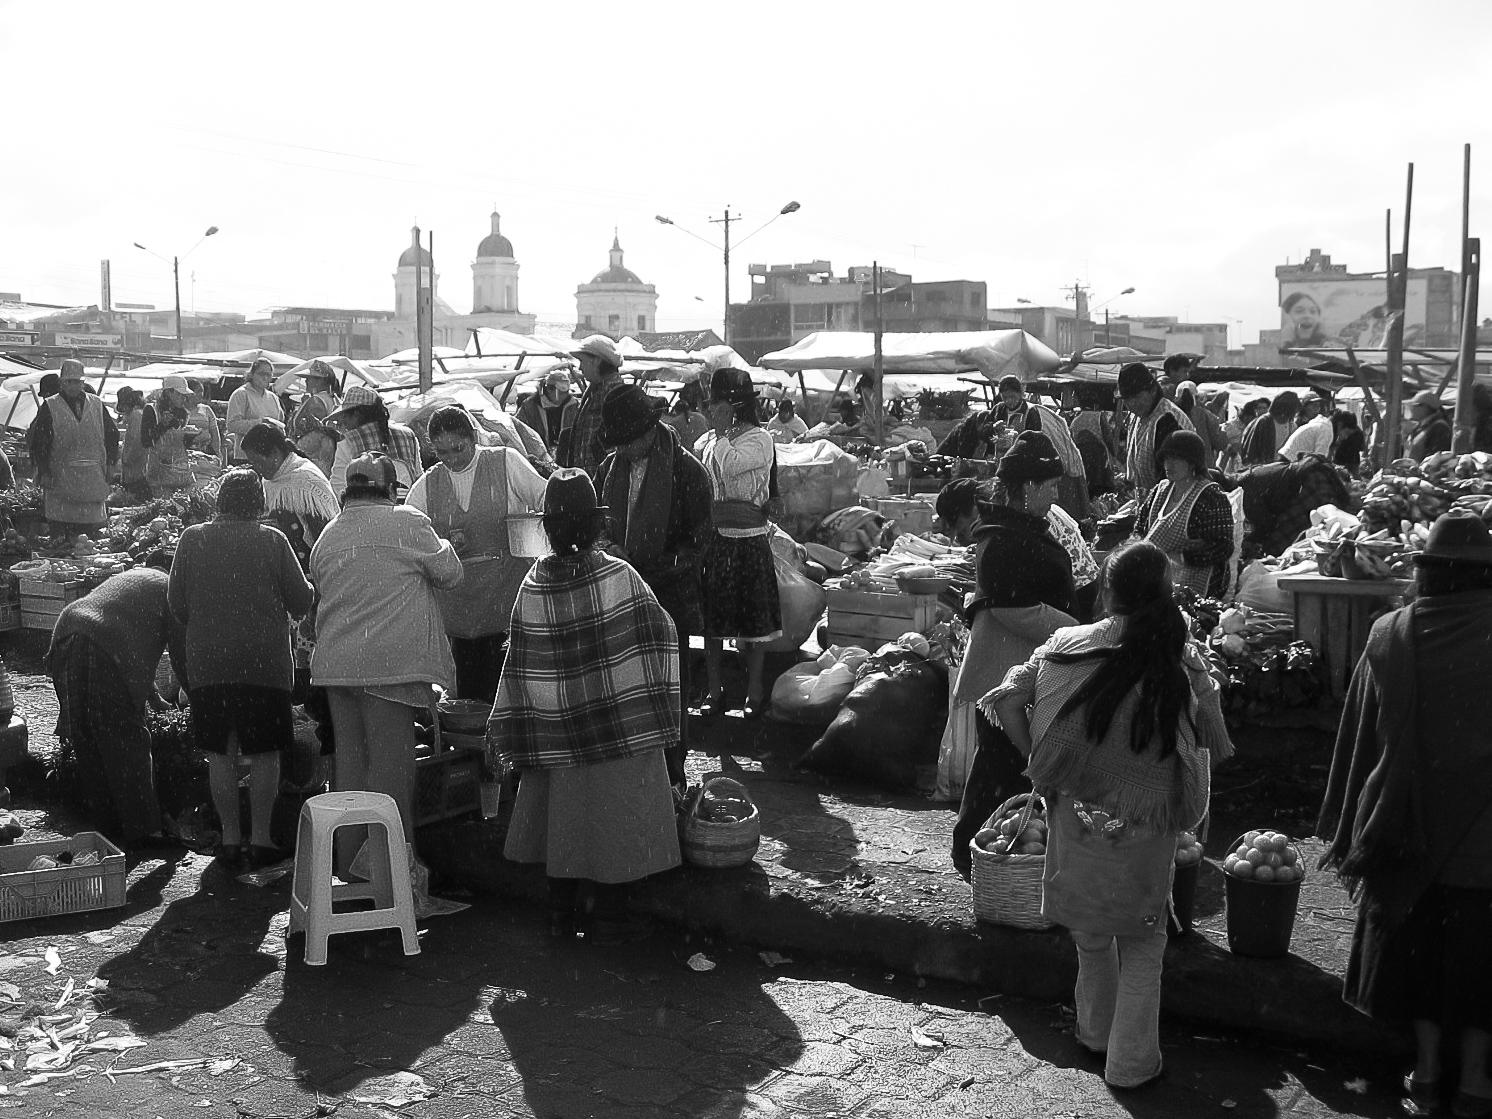 latagunga_town-8880-_market-crowd-backlit.jpg